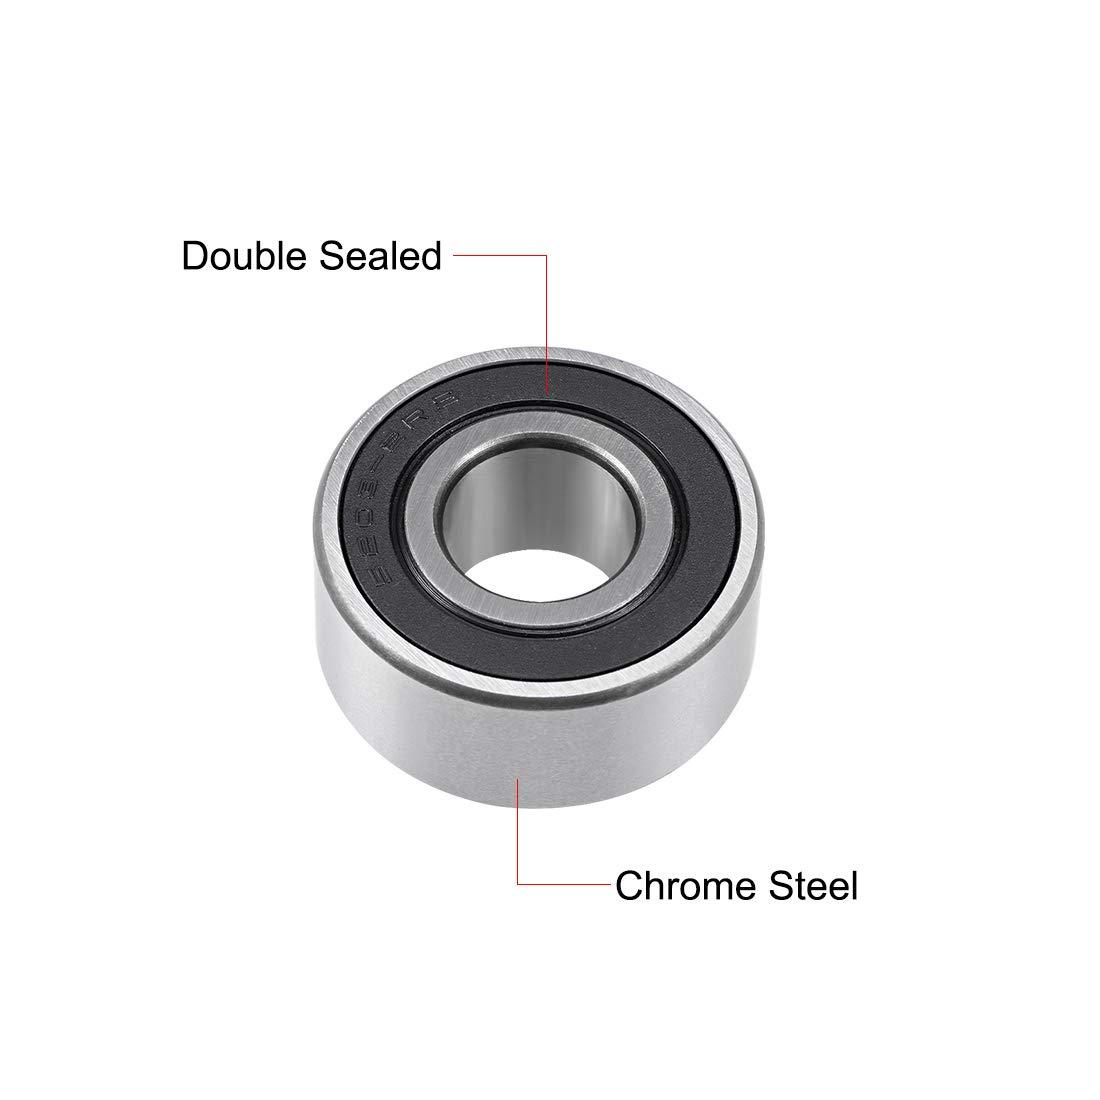 10x30x14.3 mm 5x 5200 2RS Double Row Sealed Angular Contact Ball Bearings